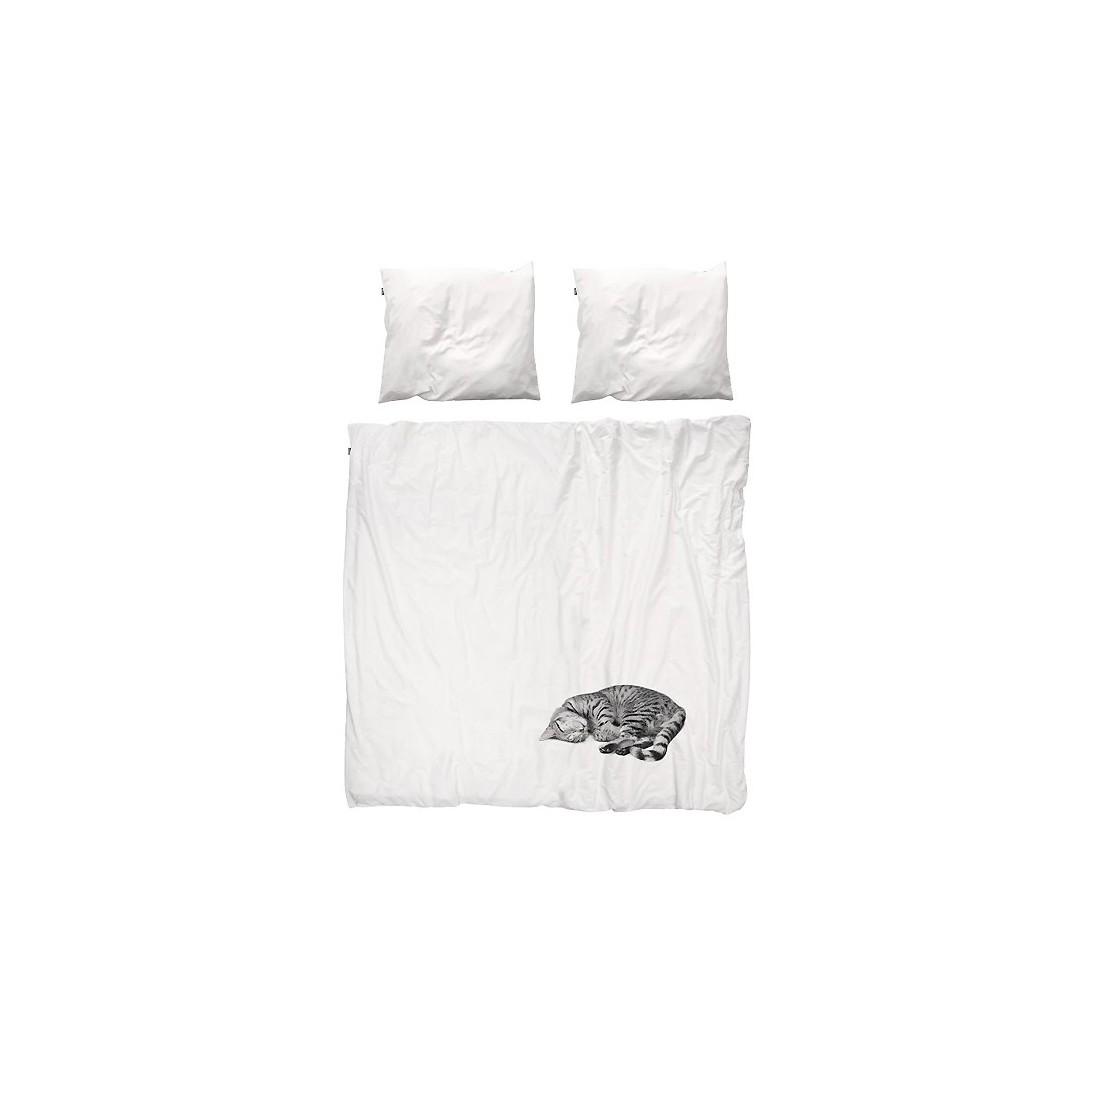 housse de couette enfant chat snurk ma chambramoi. Black Bedroom Furniture Sets. Home Design Ideas